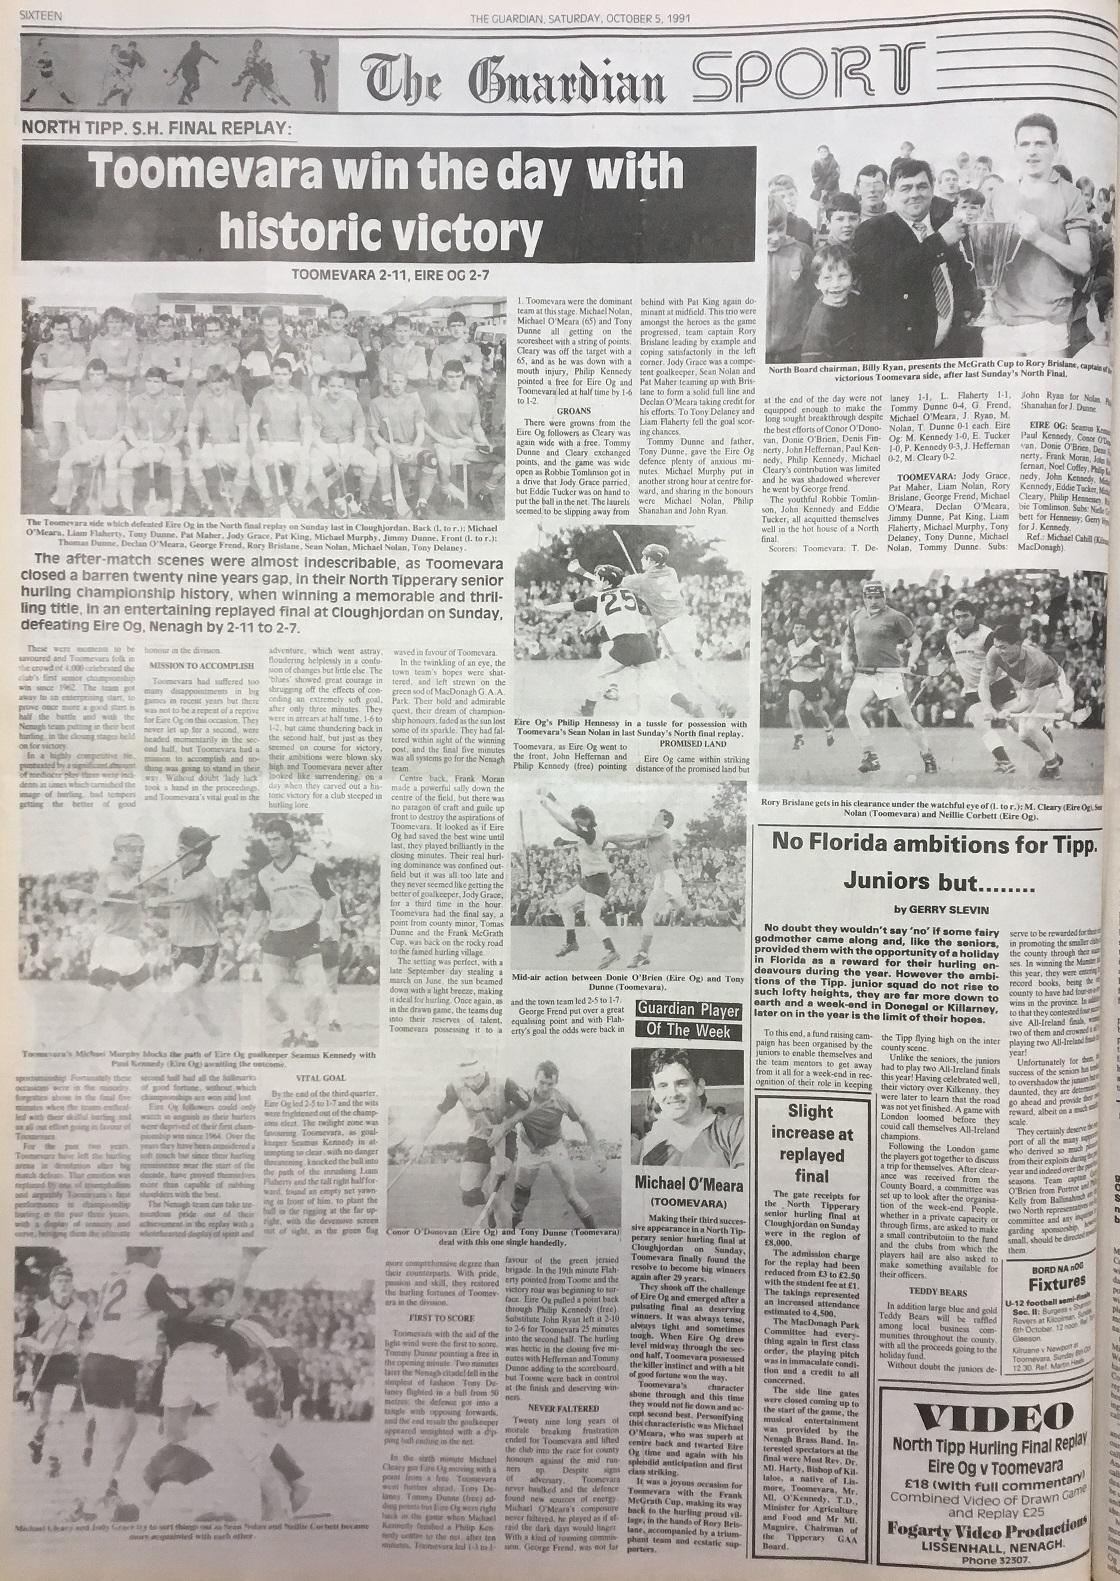 1991 North hurling final replay